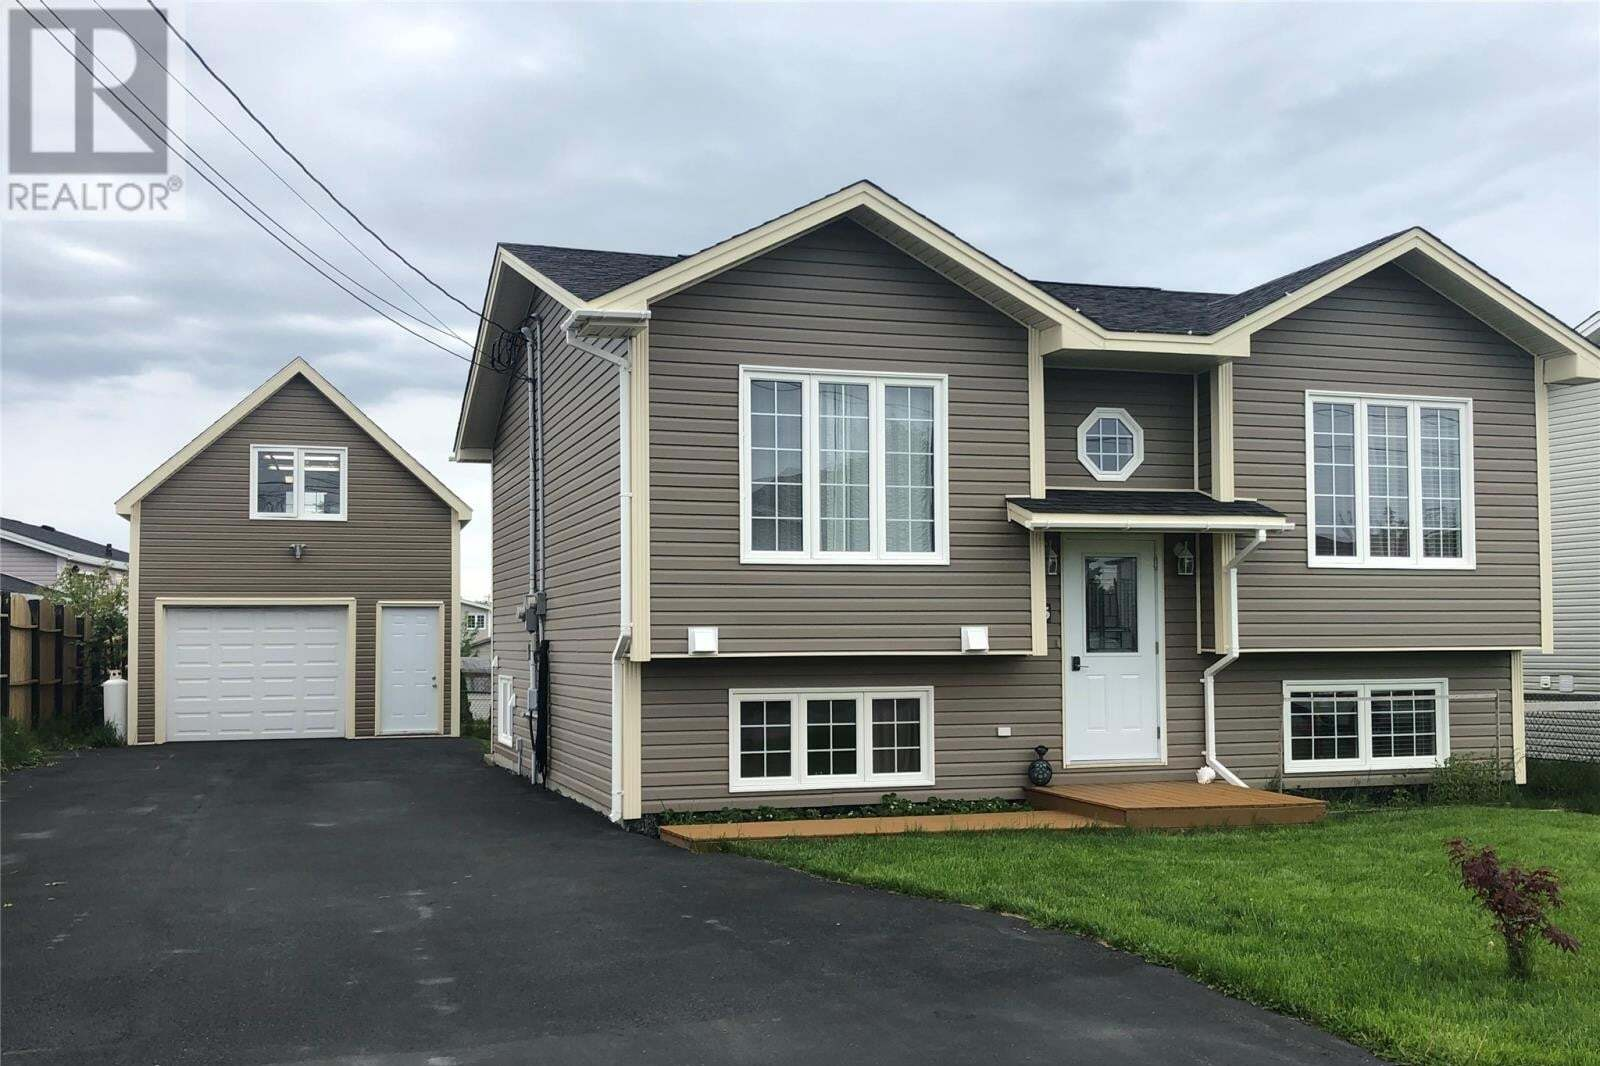 House for sale at 5 Santa Maria Dr Torbay Newfoundland - MLS: 1216405